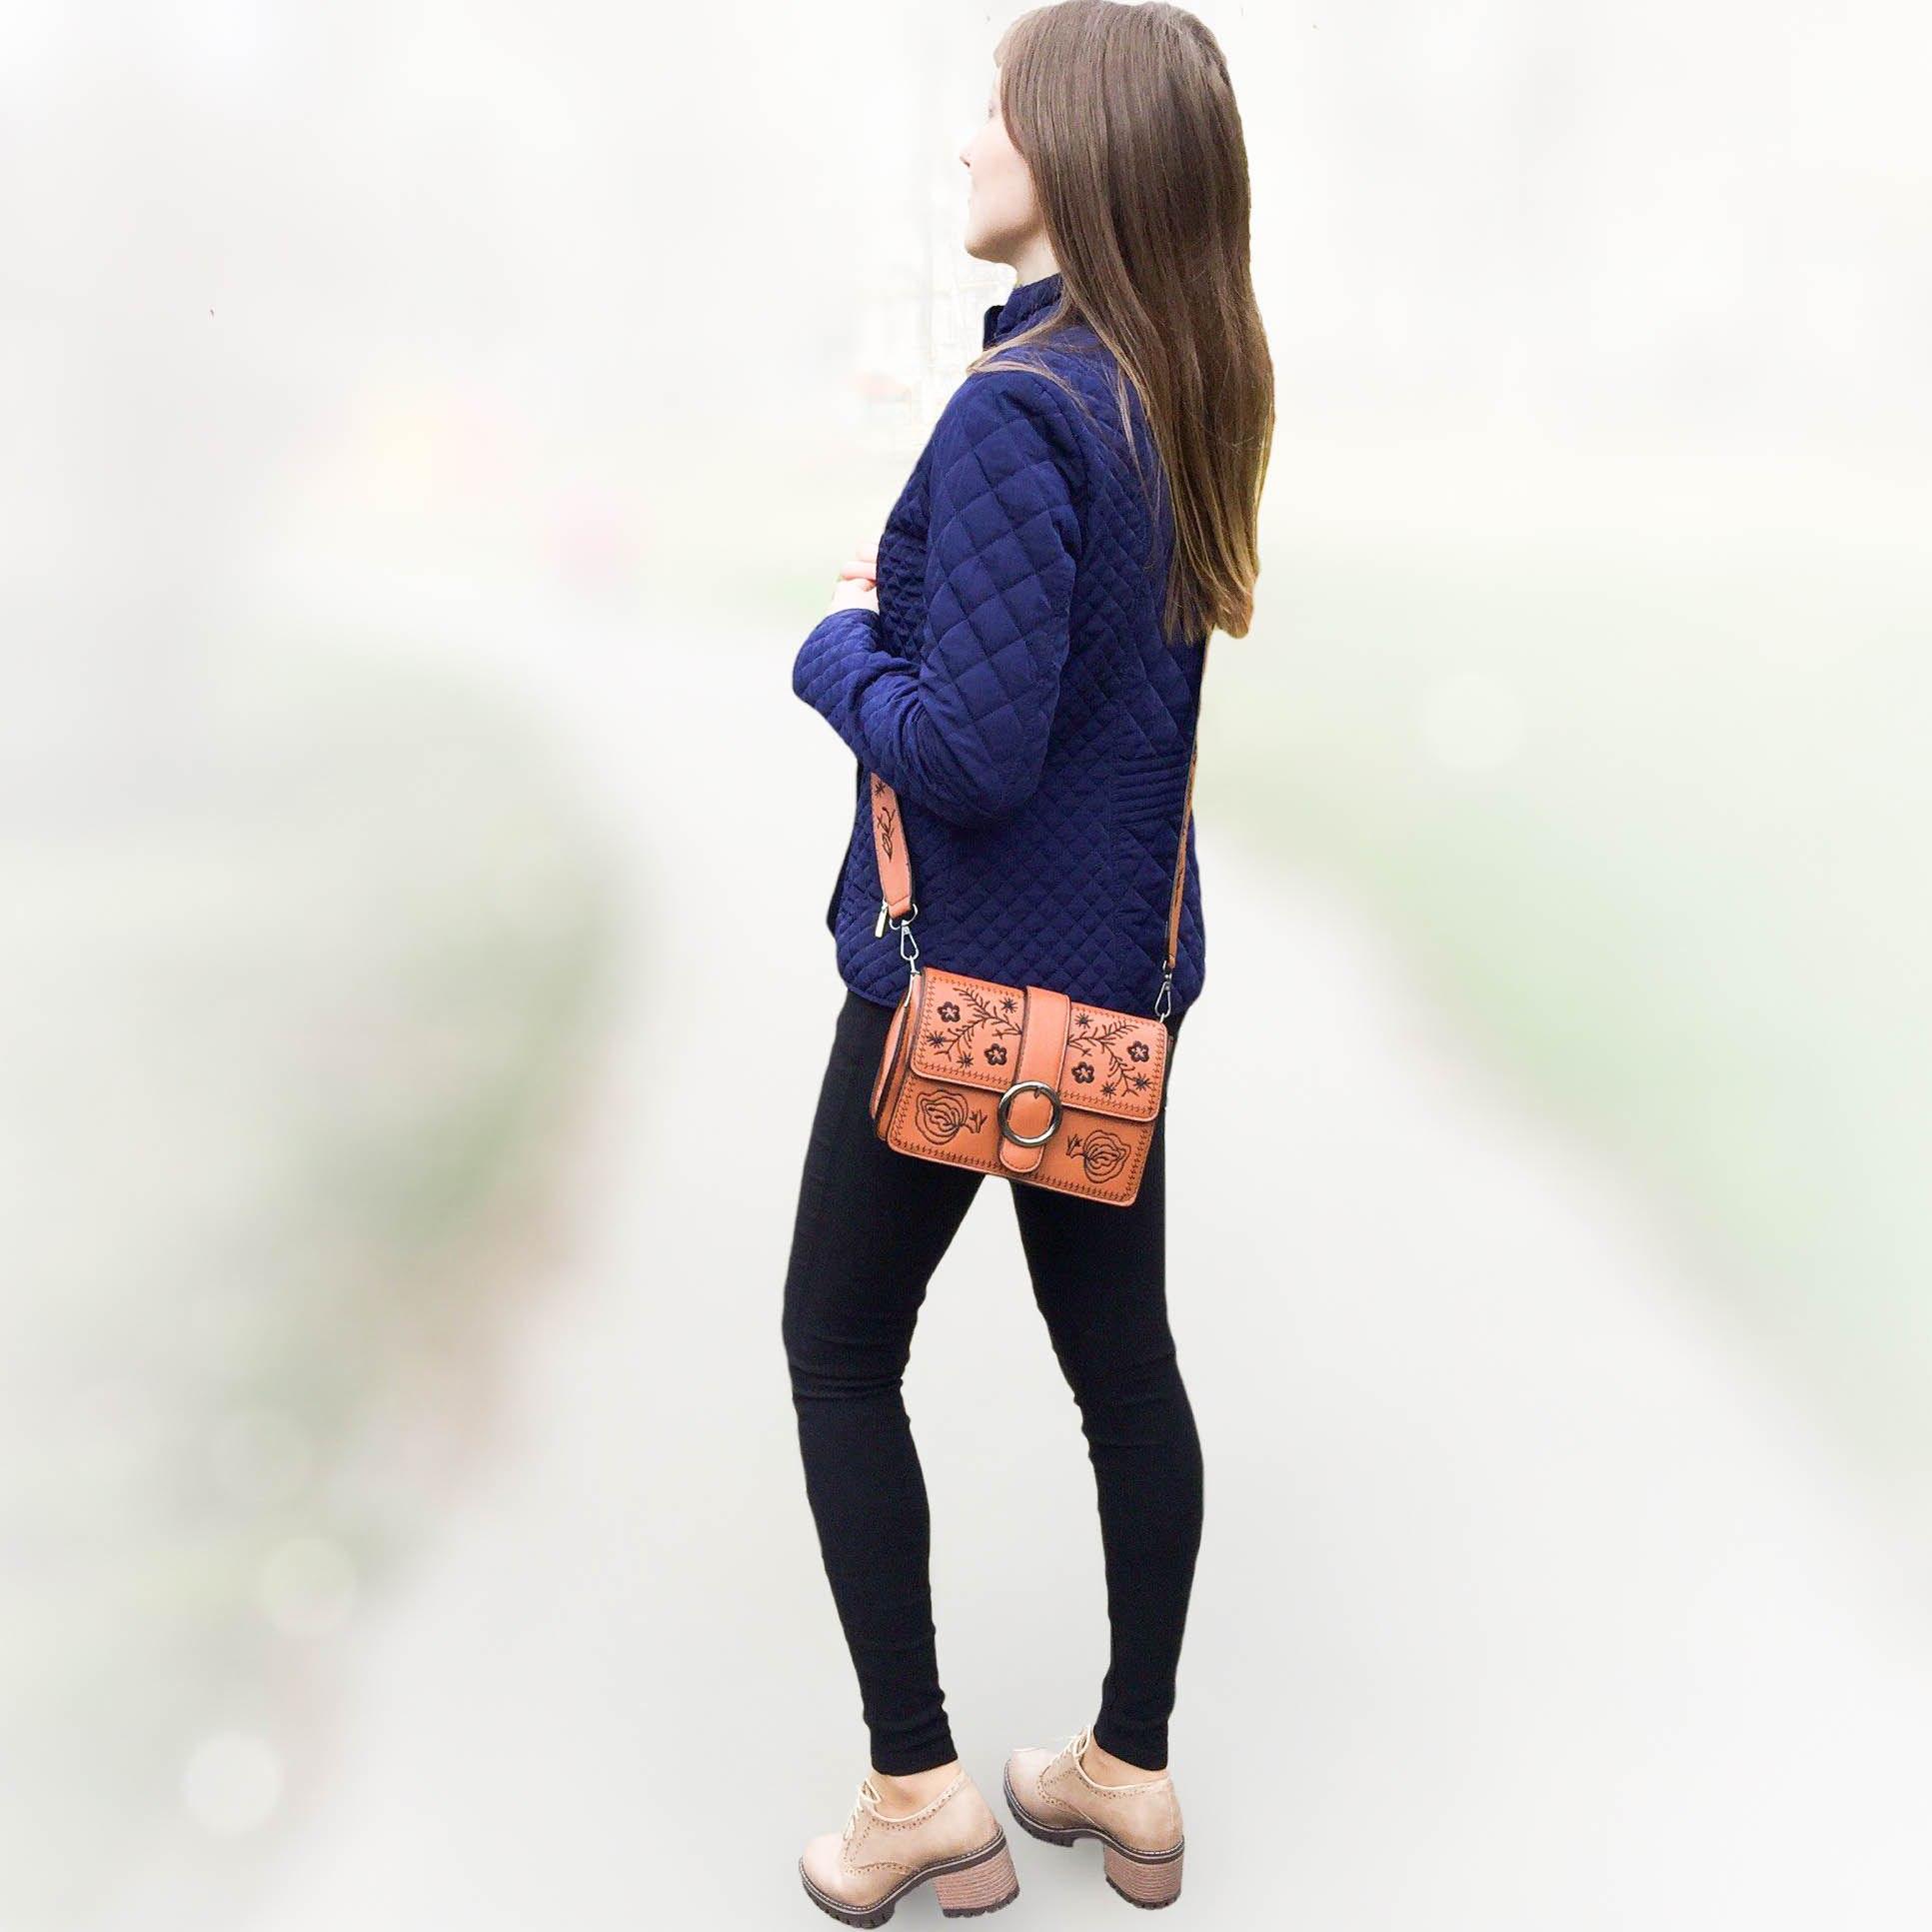 Крутая сумка с вышивкой